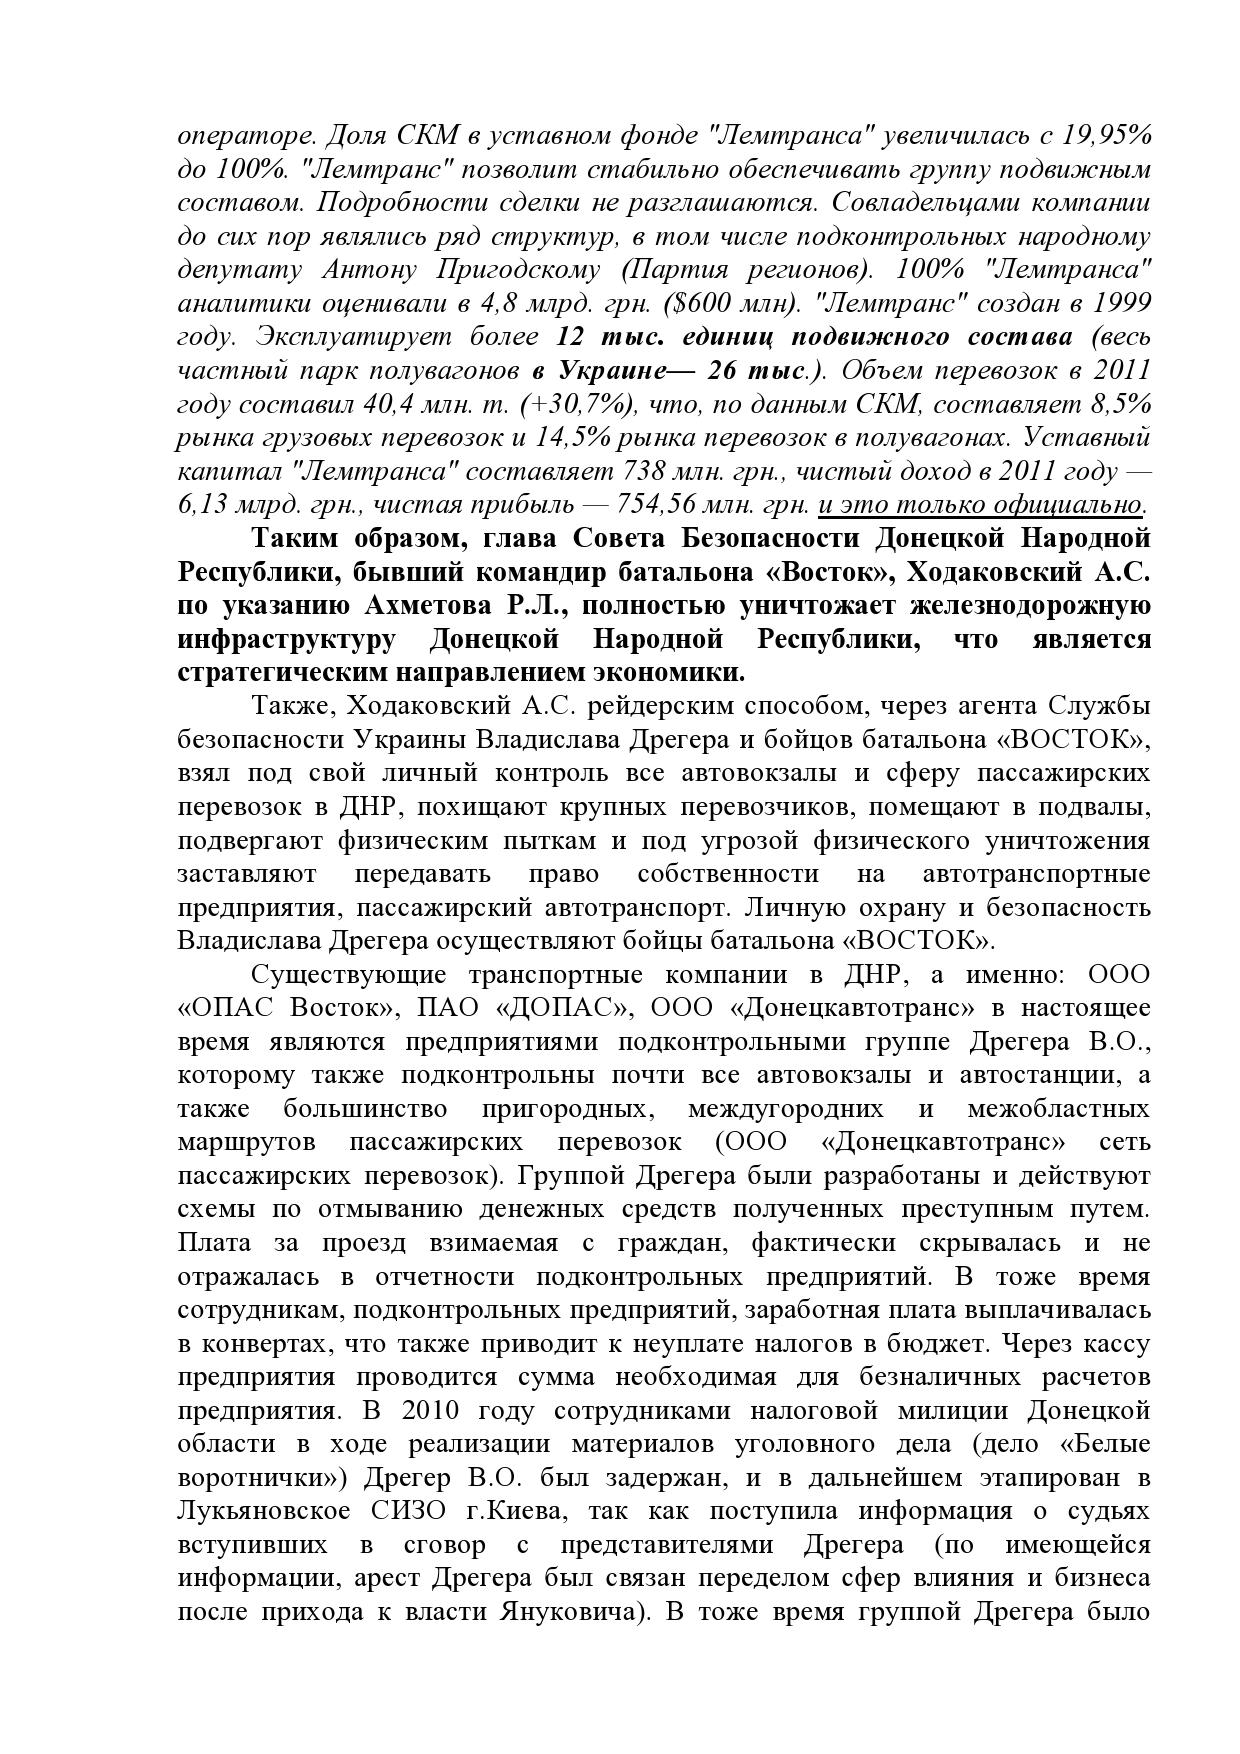 https://b0ltai.files.wordpress.com/2015/09/page0004.jpg